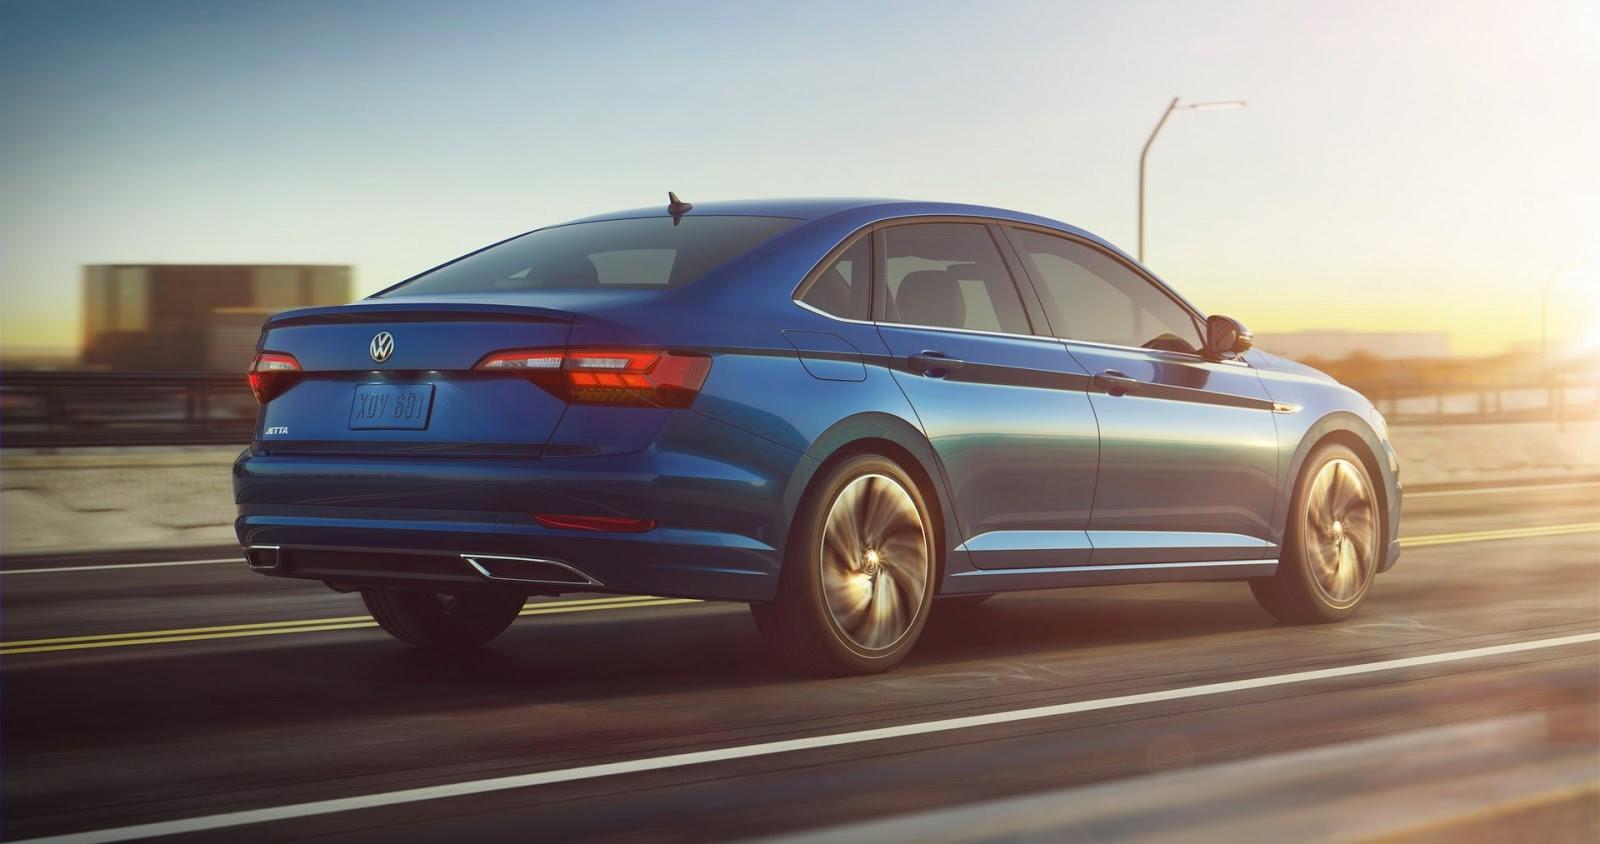 Nuevo Volkswagen Jetta 2019 exterior zaga y perfil